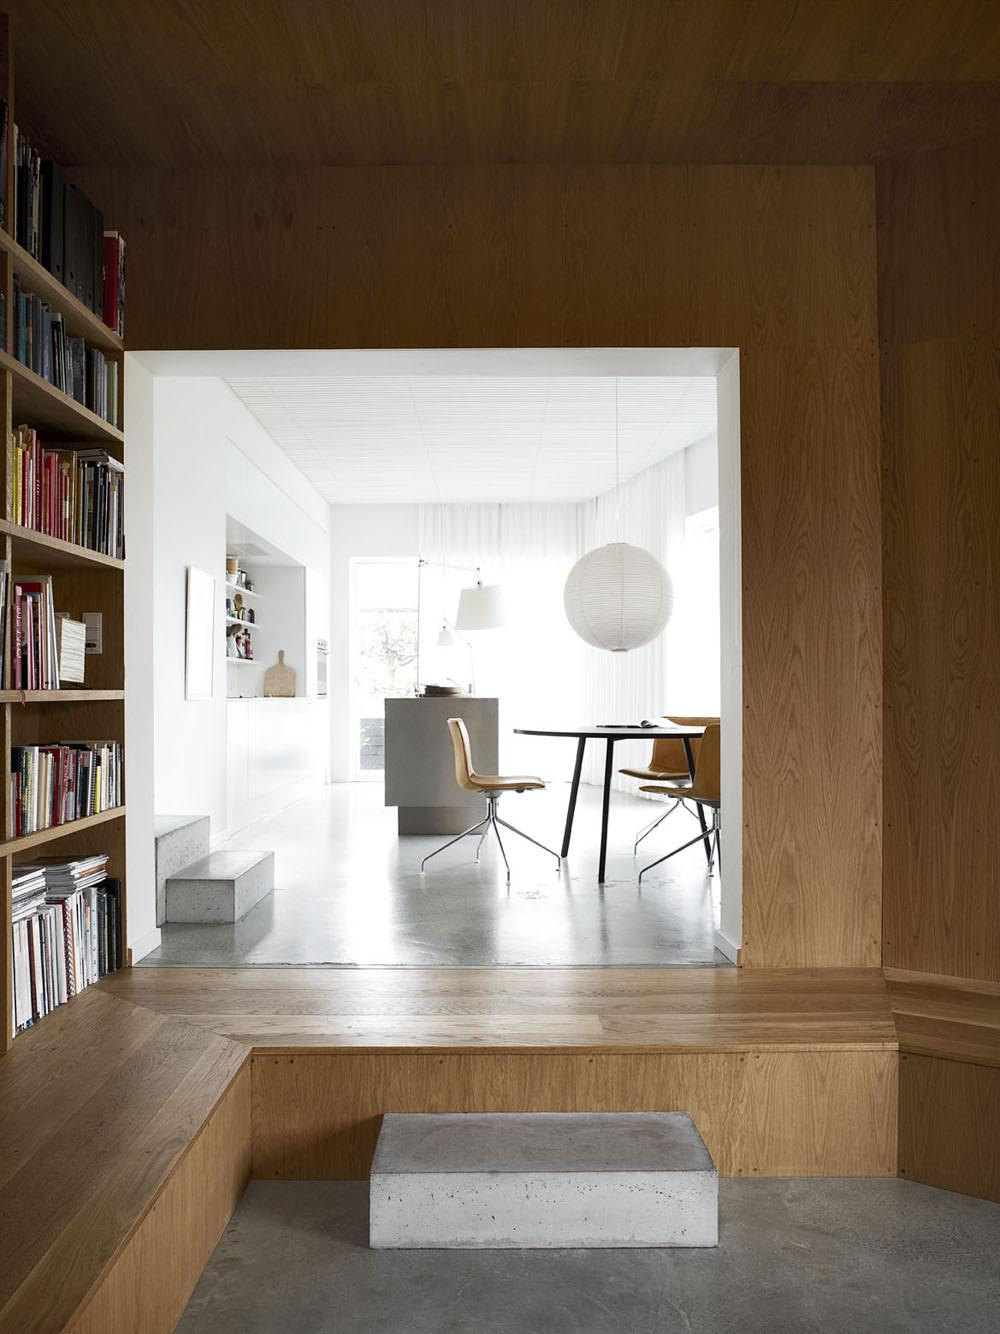 52d609dbe8e44ef8bf00012d_villa-wienberg-friis-moltke-wienberg-architects-_portada.jpg